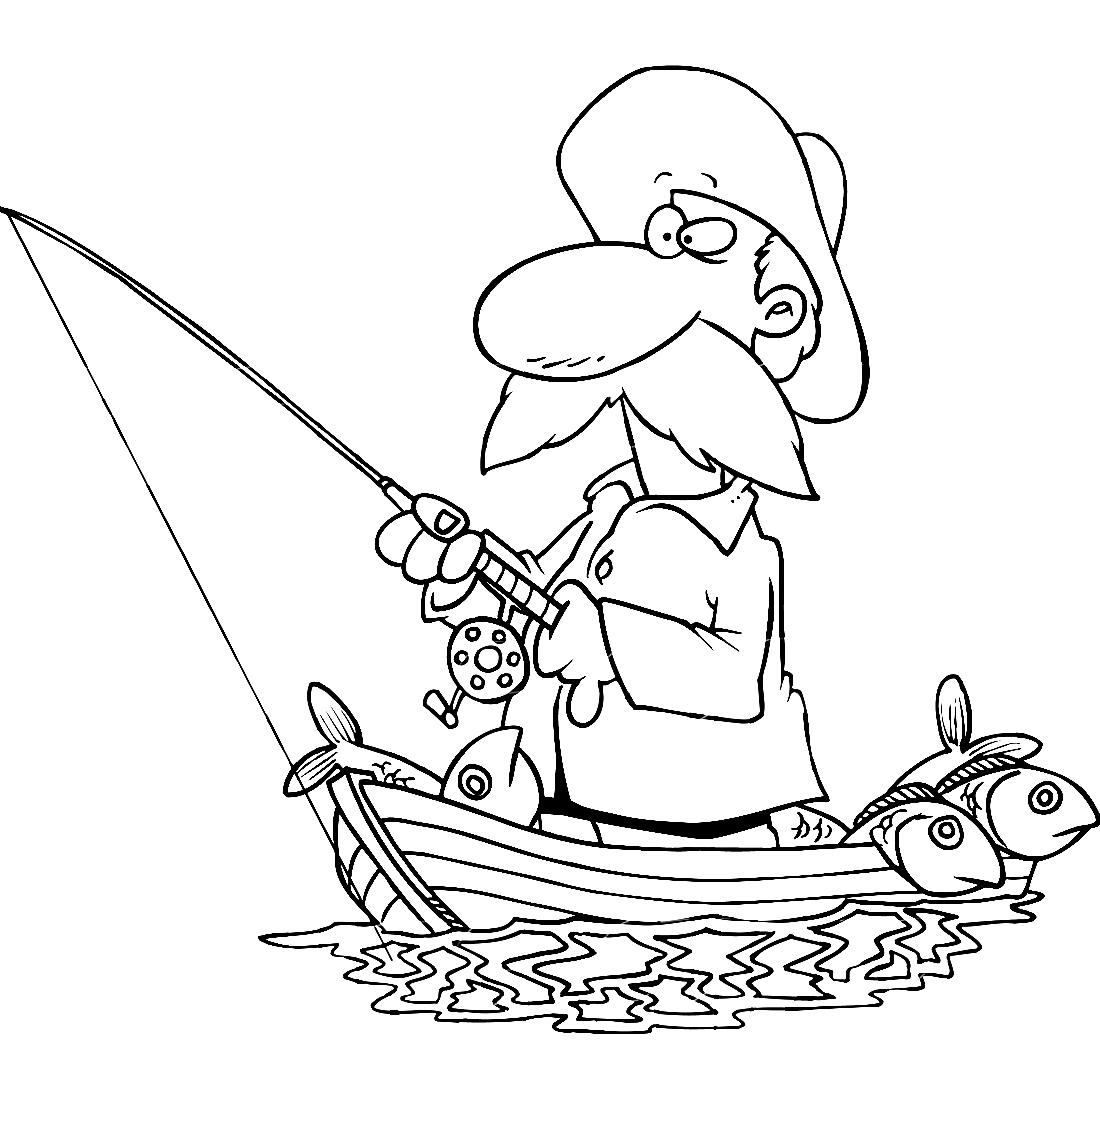 Рыбак с усами - раскраска №11962 | Printonic.ru